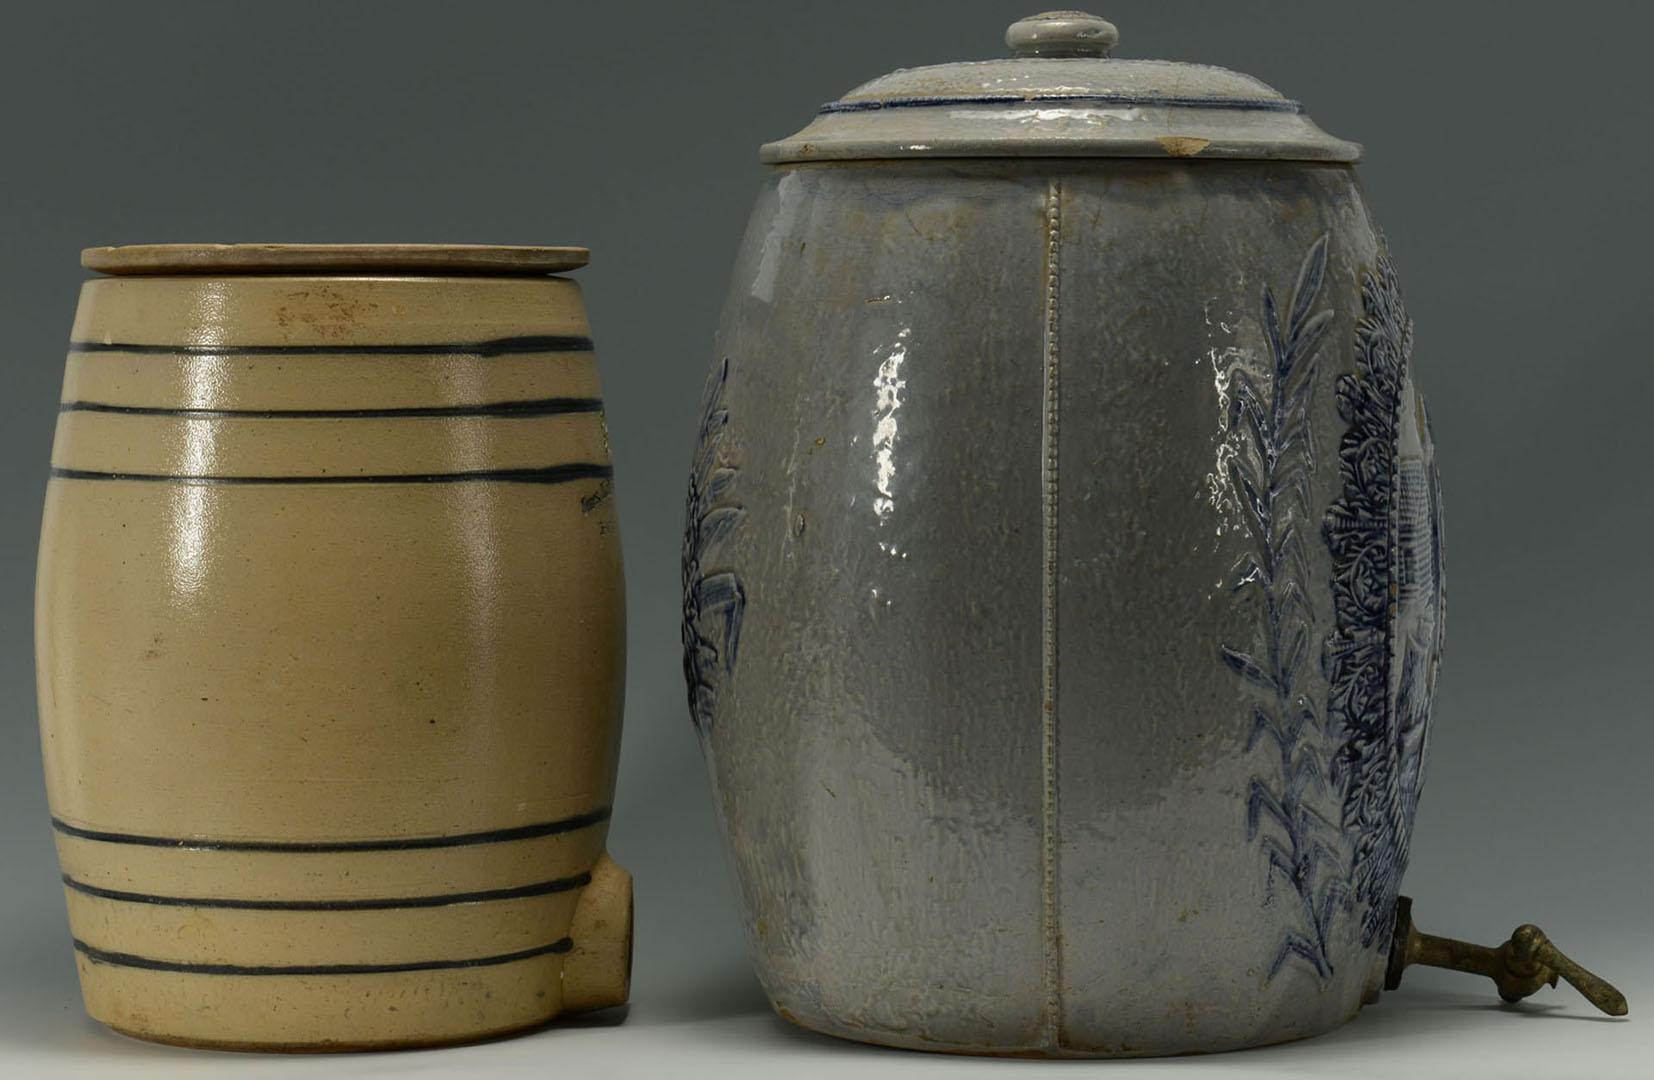 Lot 2872348: 2 Cobalt Blue Stoneware Coolers